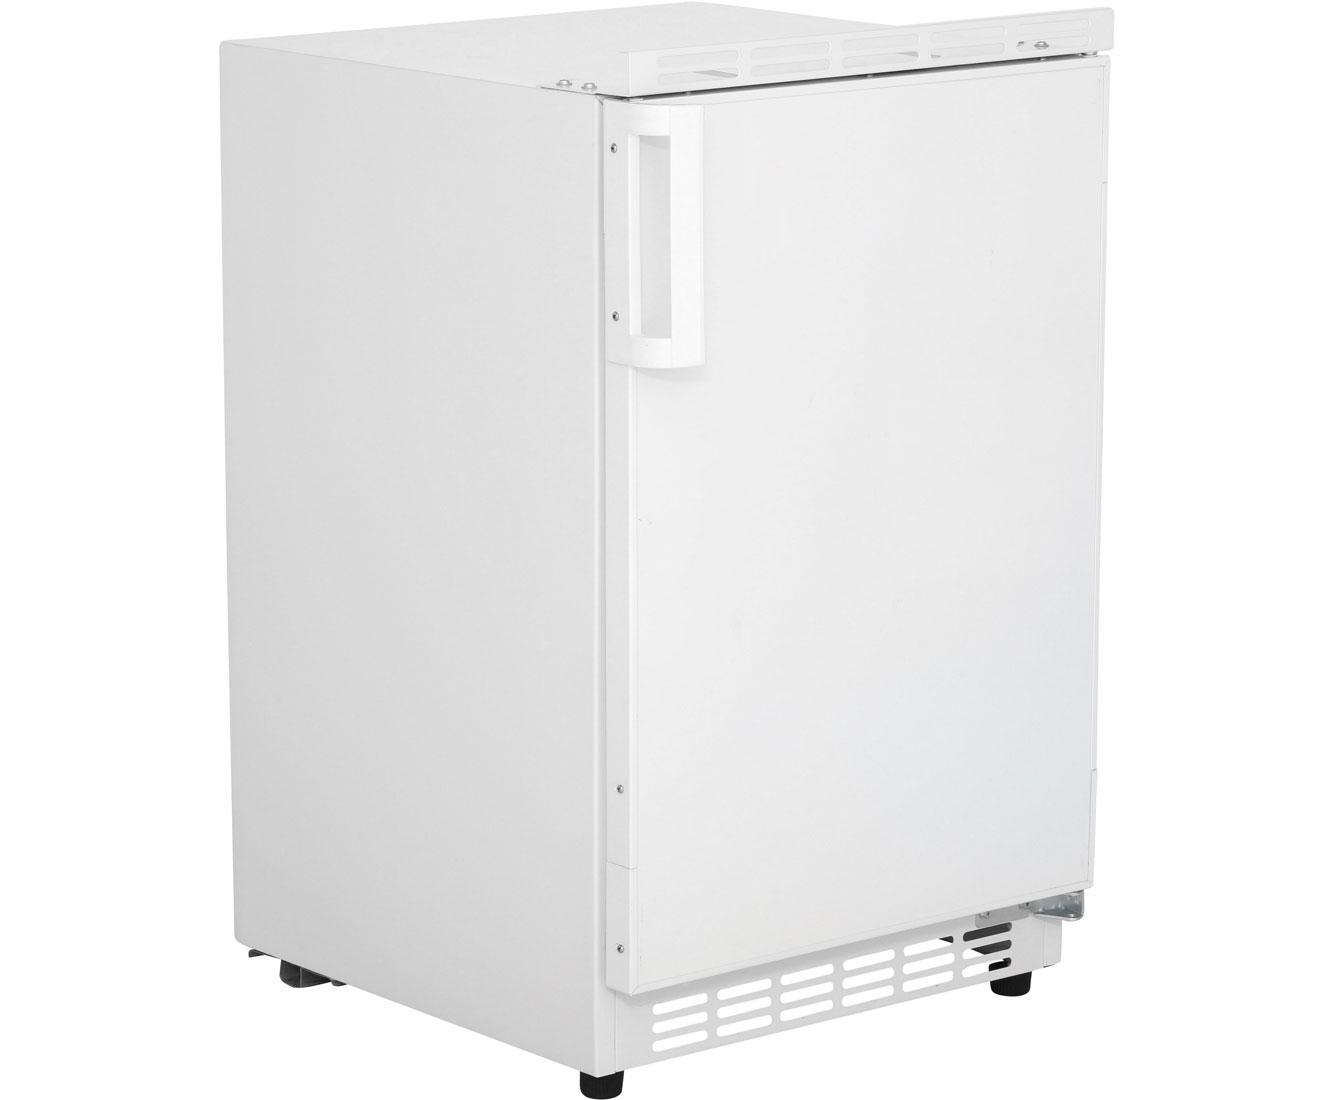 Amica Unterbau Kühlschrank 50 Cm : Amica uks kühlschrank unterbau cm weiß neu ebay